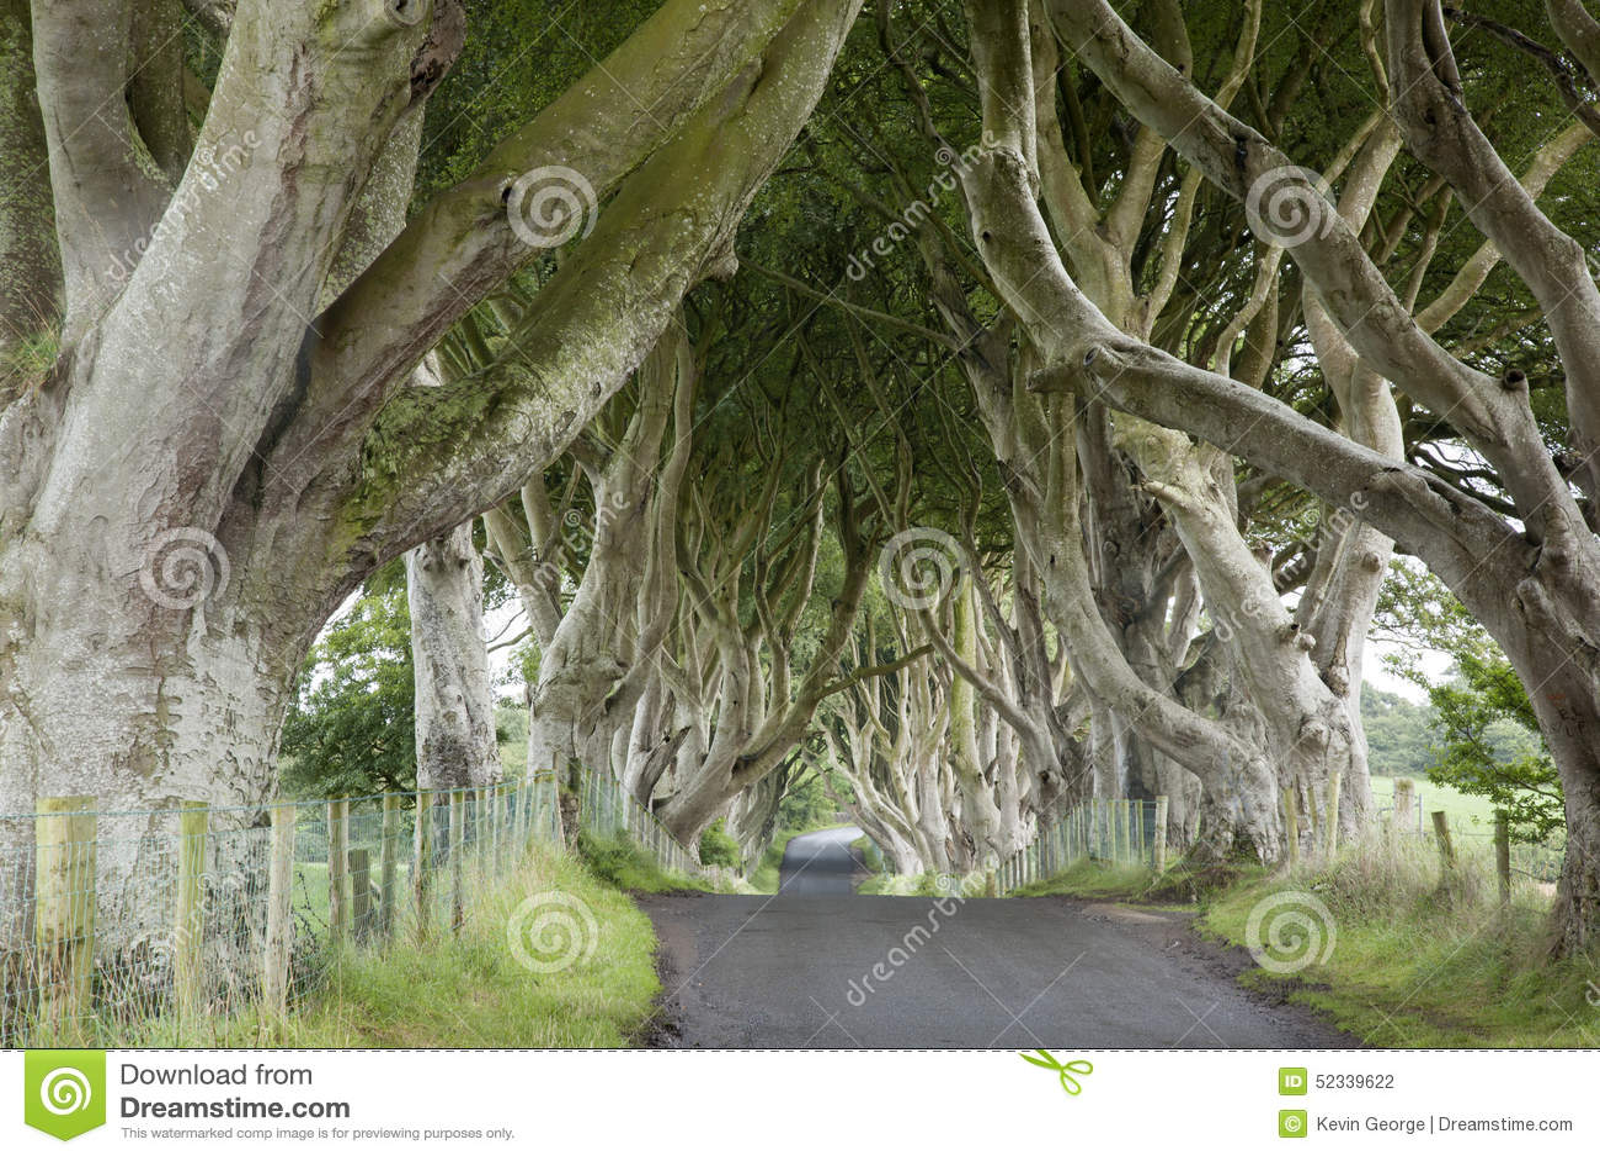 Dark Hedges, County Antrim